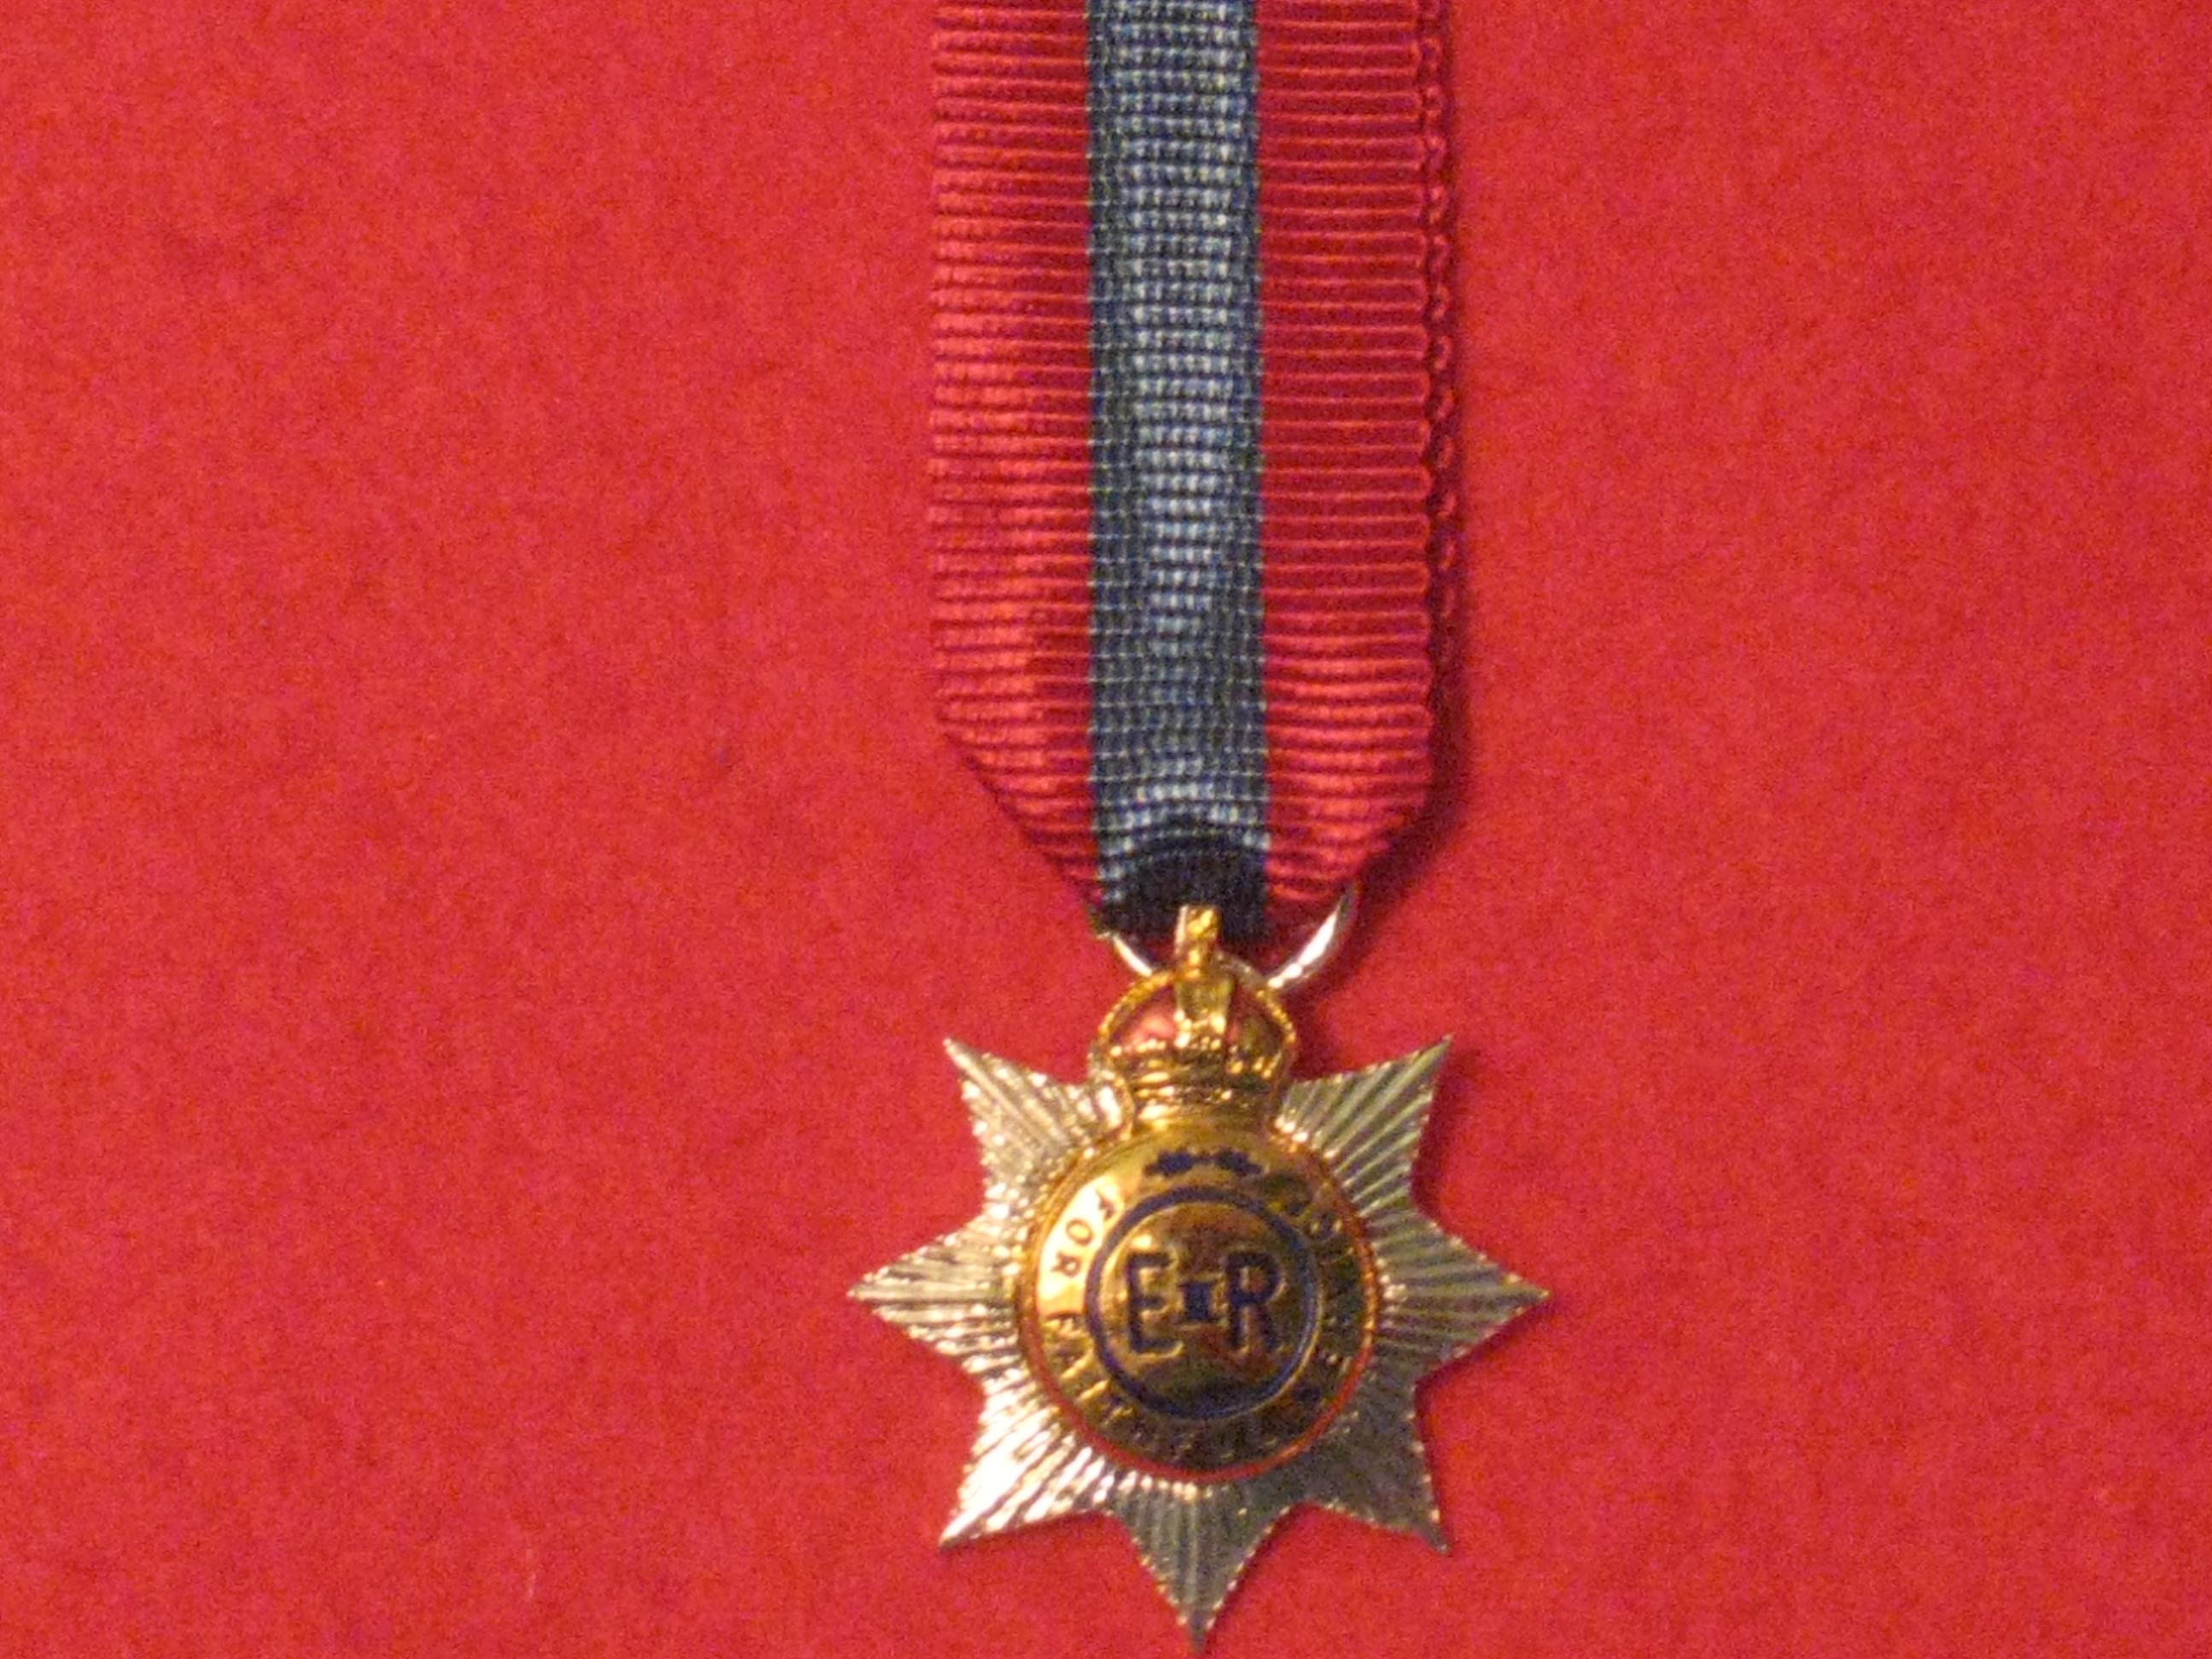 Miniature Medal DISTINGUISHED SERVICE ORDER EIIR